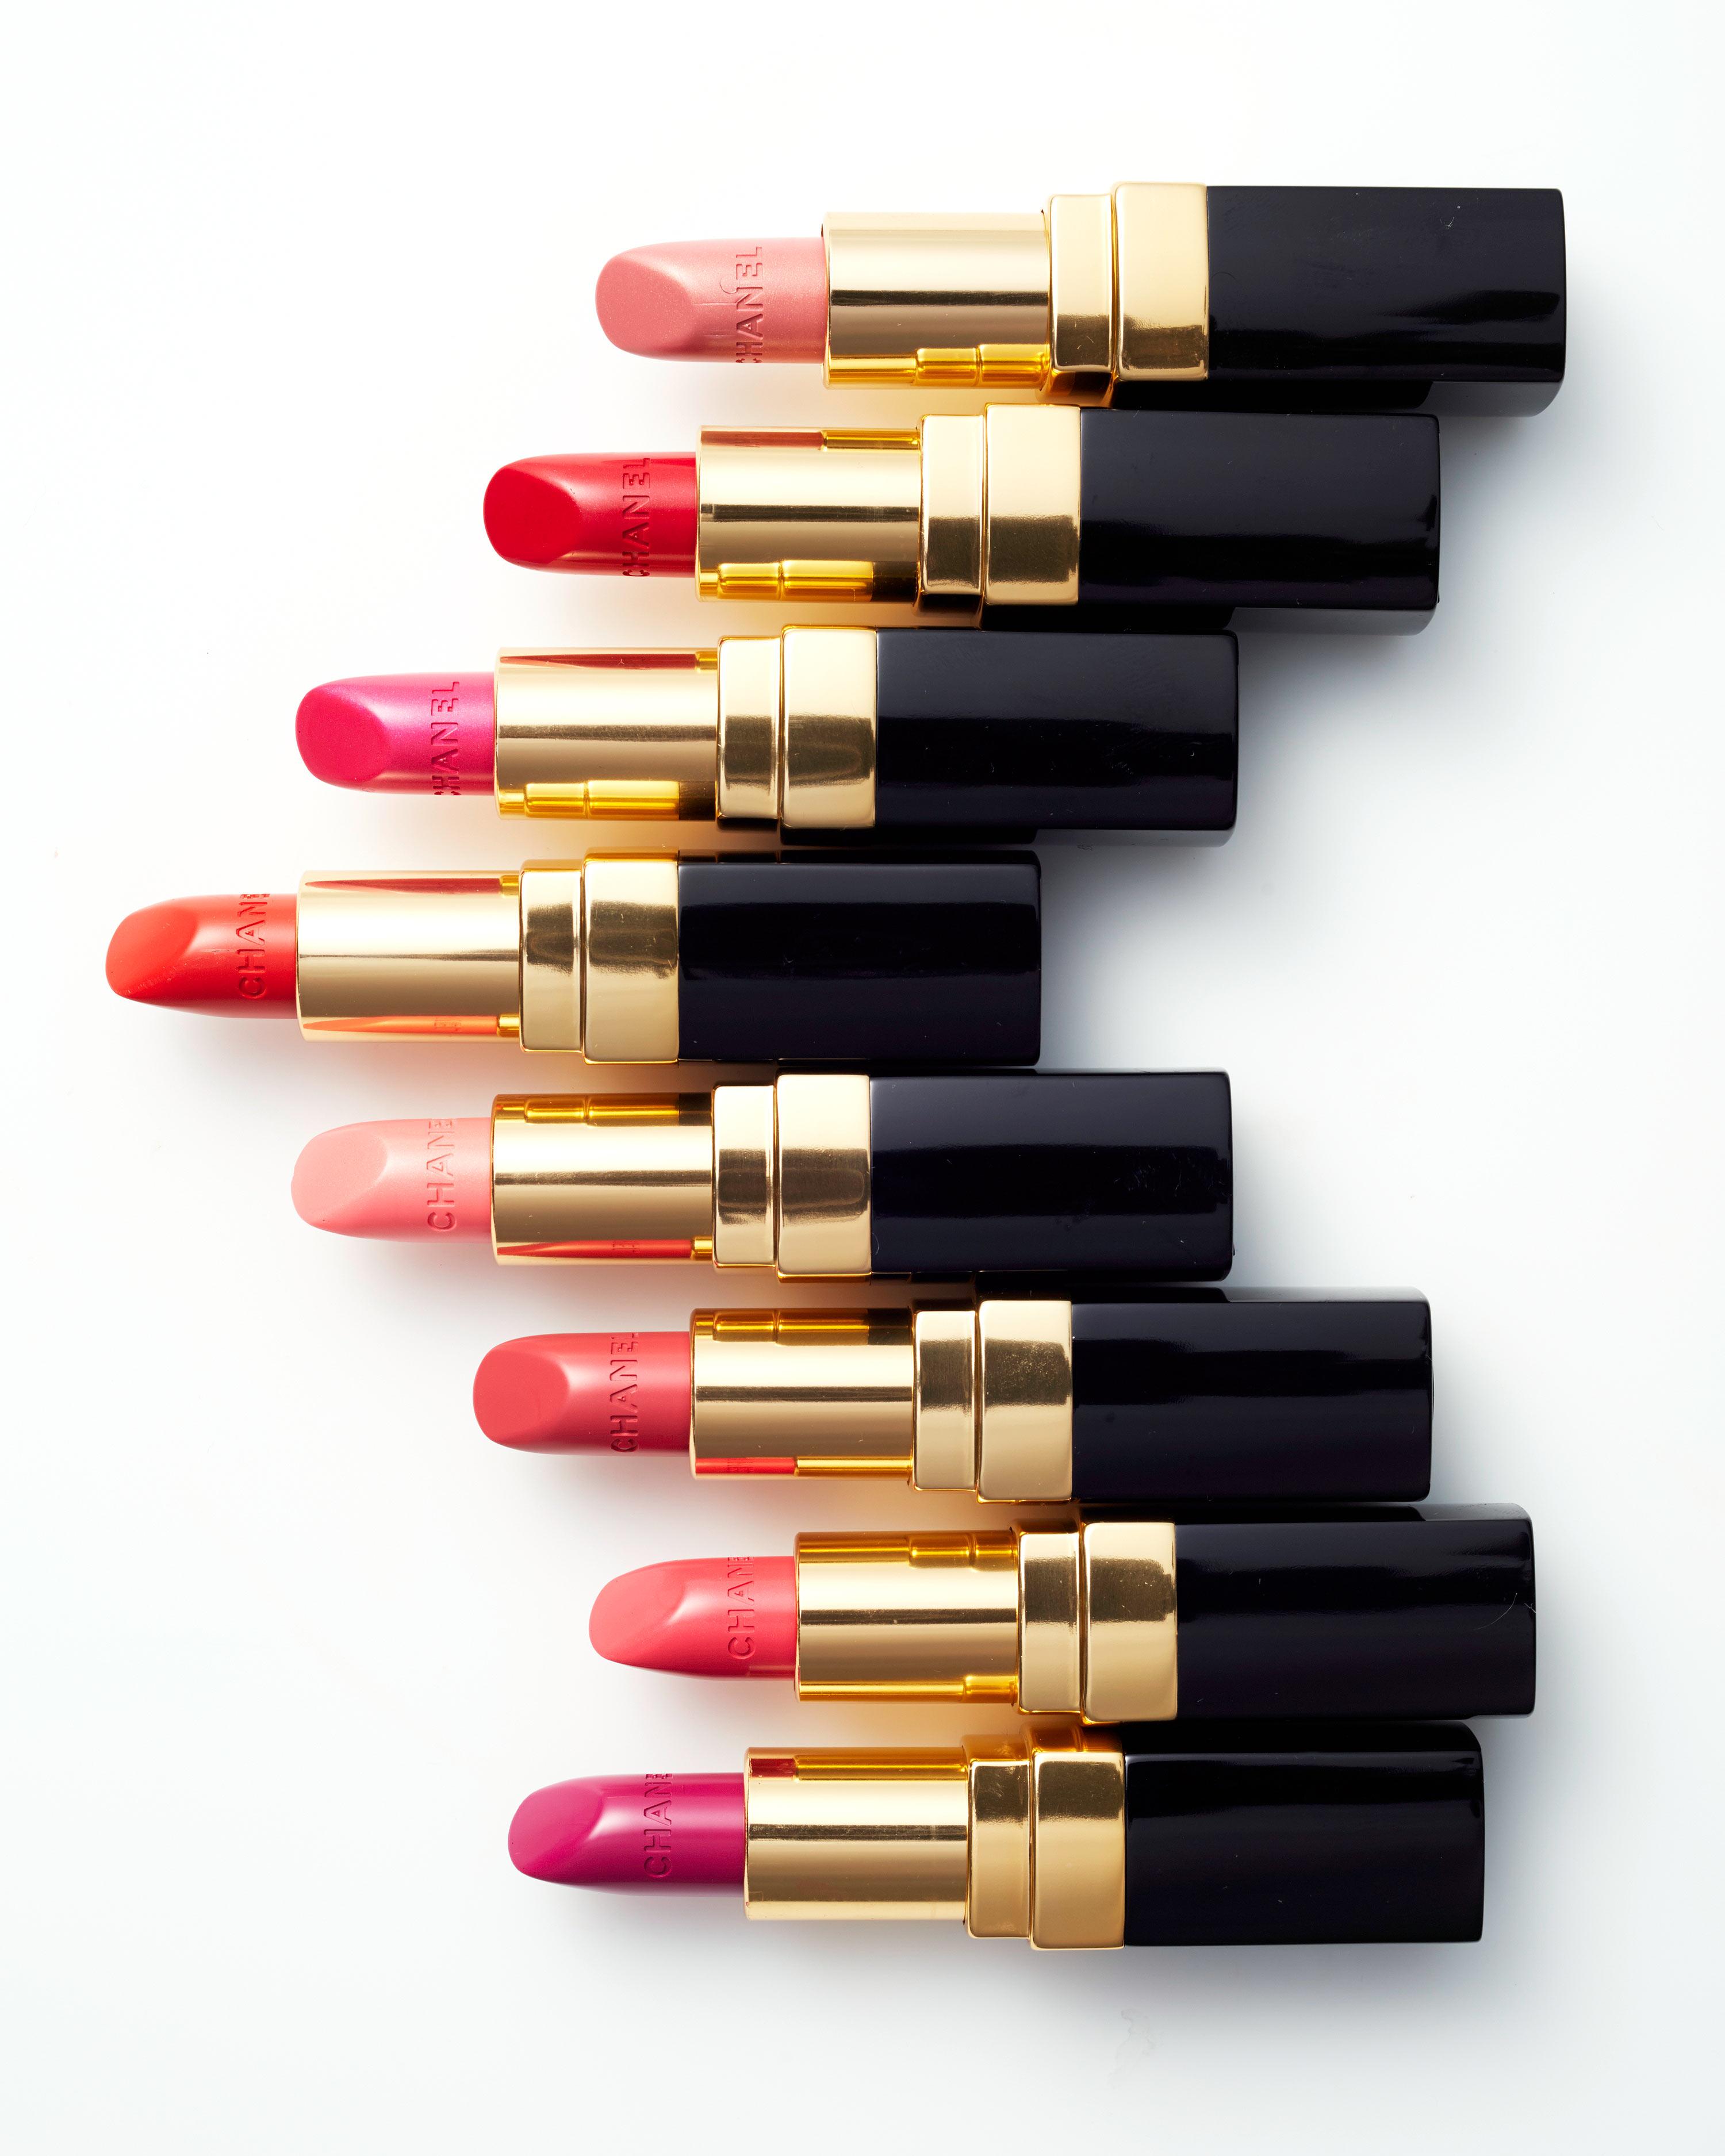 big-day-beauty-awards-makeup-primary-image-0216.jpg